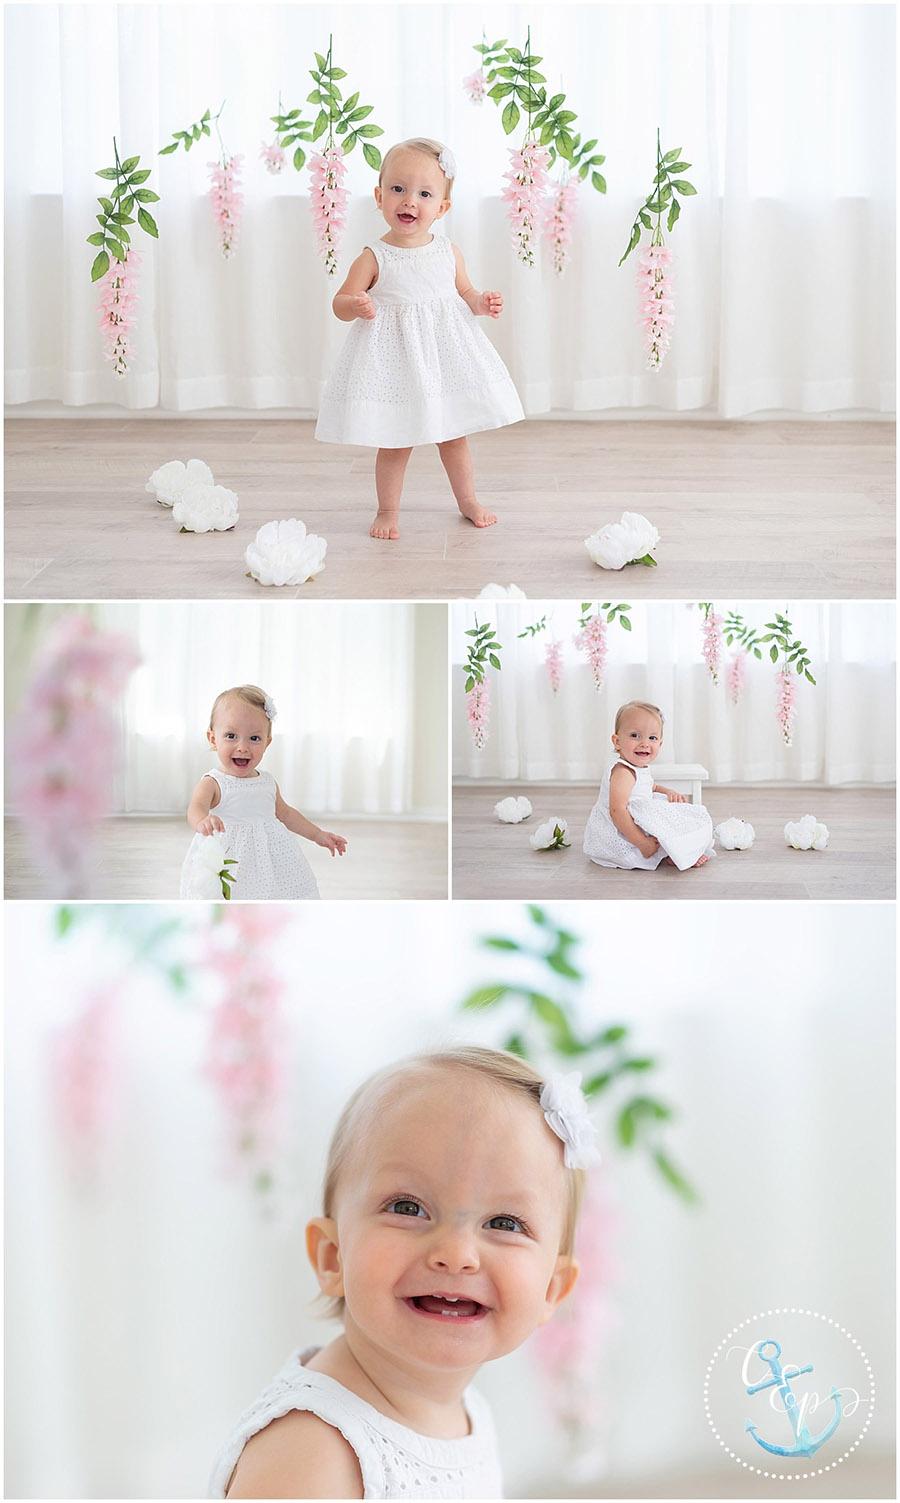 Baby Milestone Session Frederick MD, Floral Wisteria Set, Cristina Elisa Photography LLC, Natural Light Studio